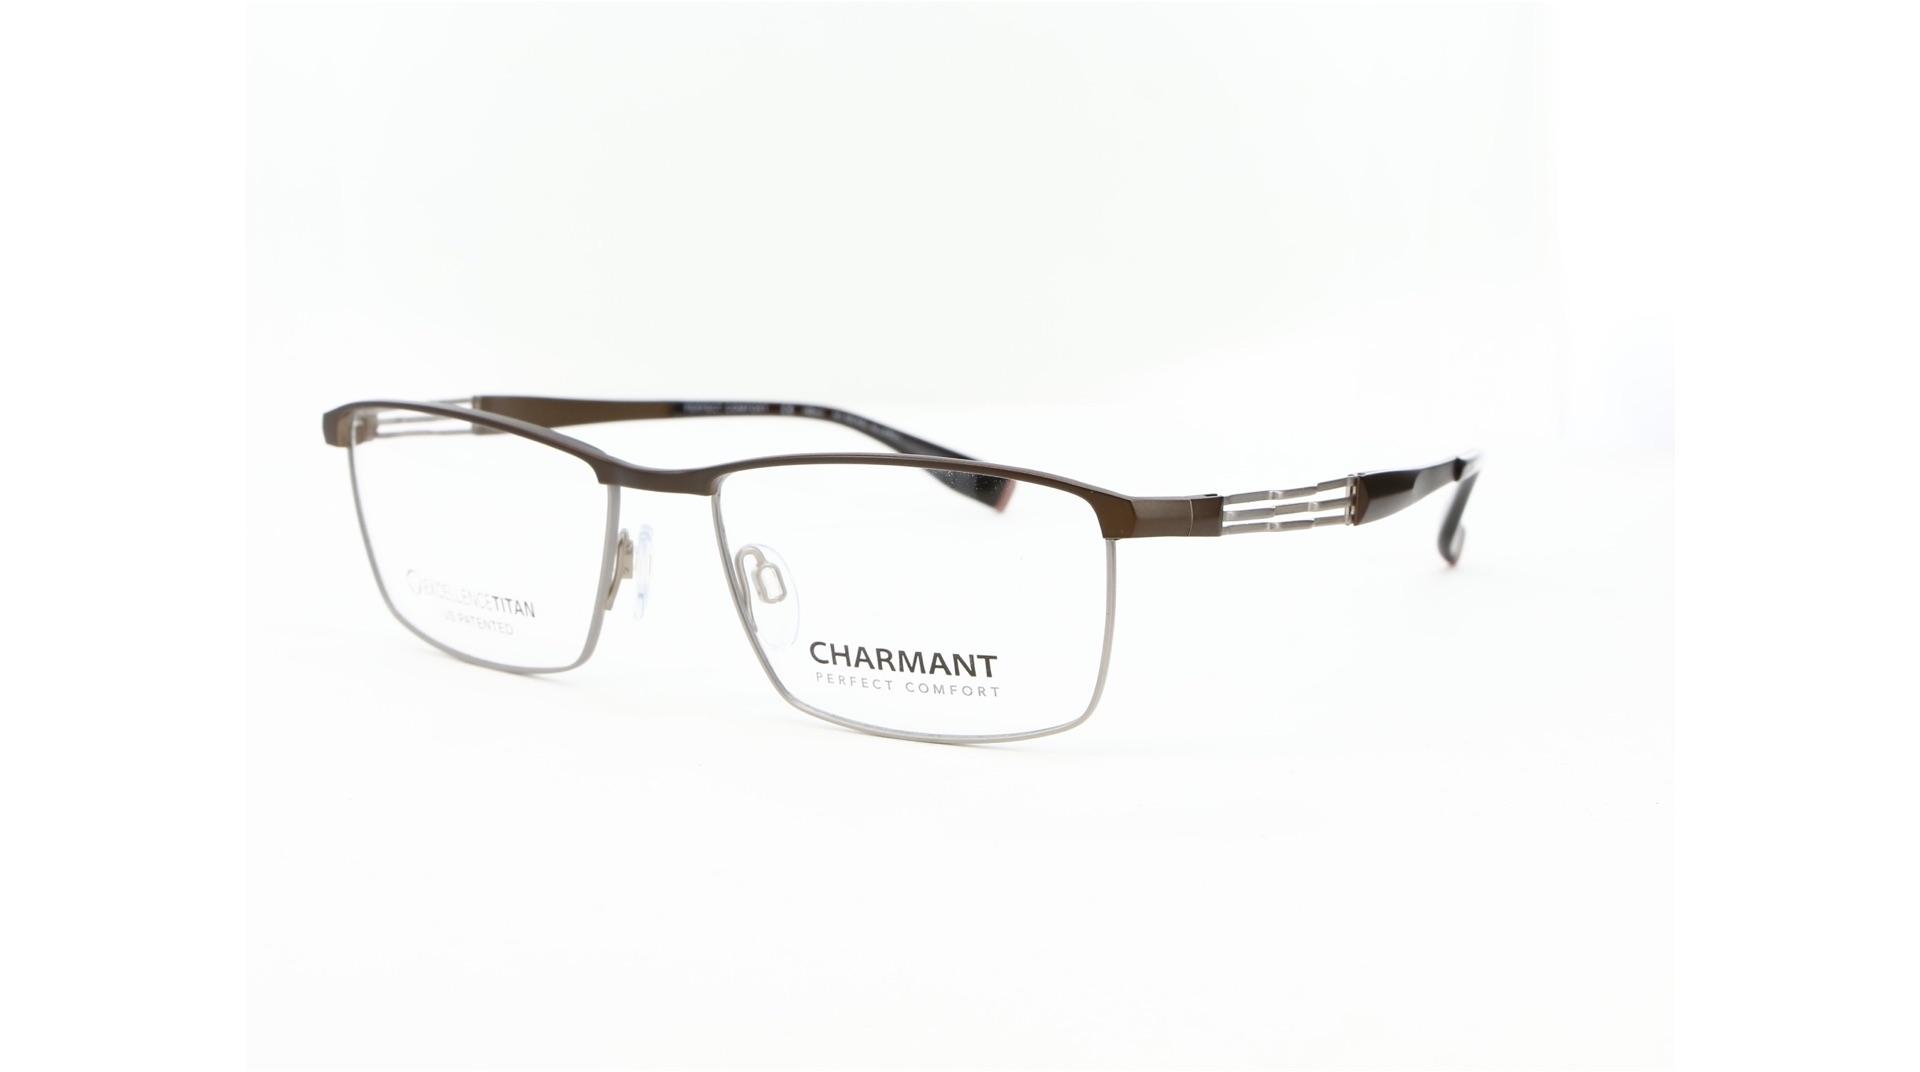 Charmant - ref: 81902